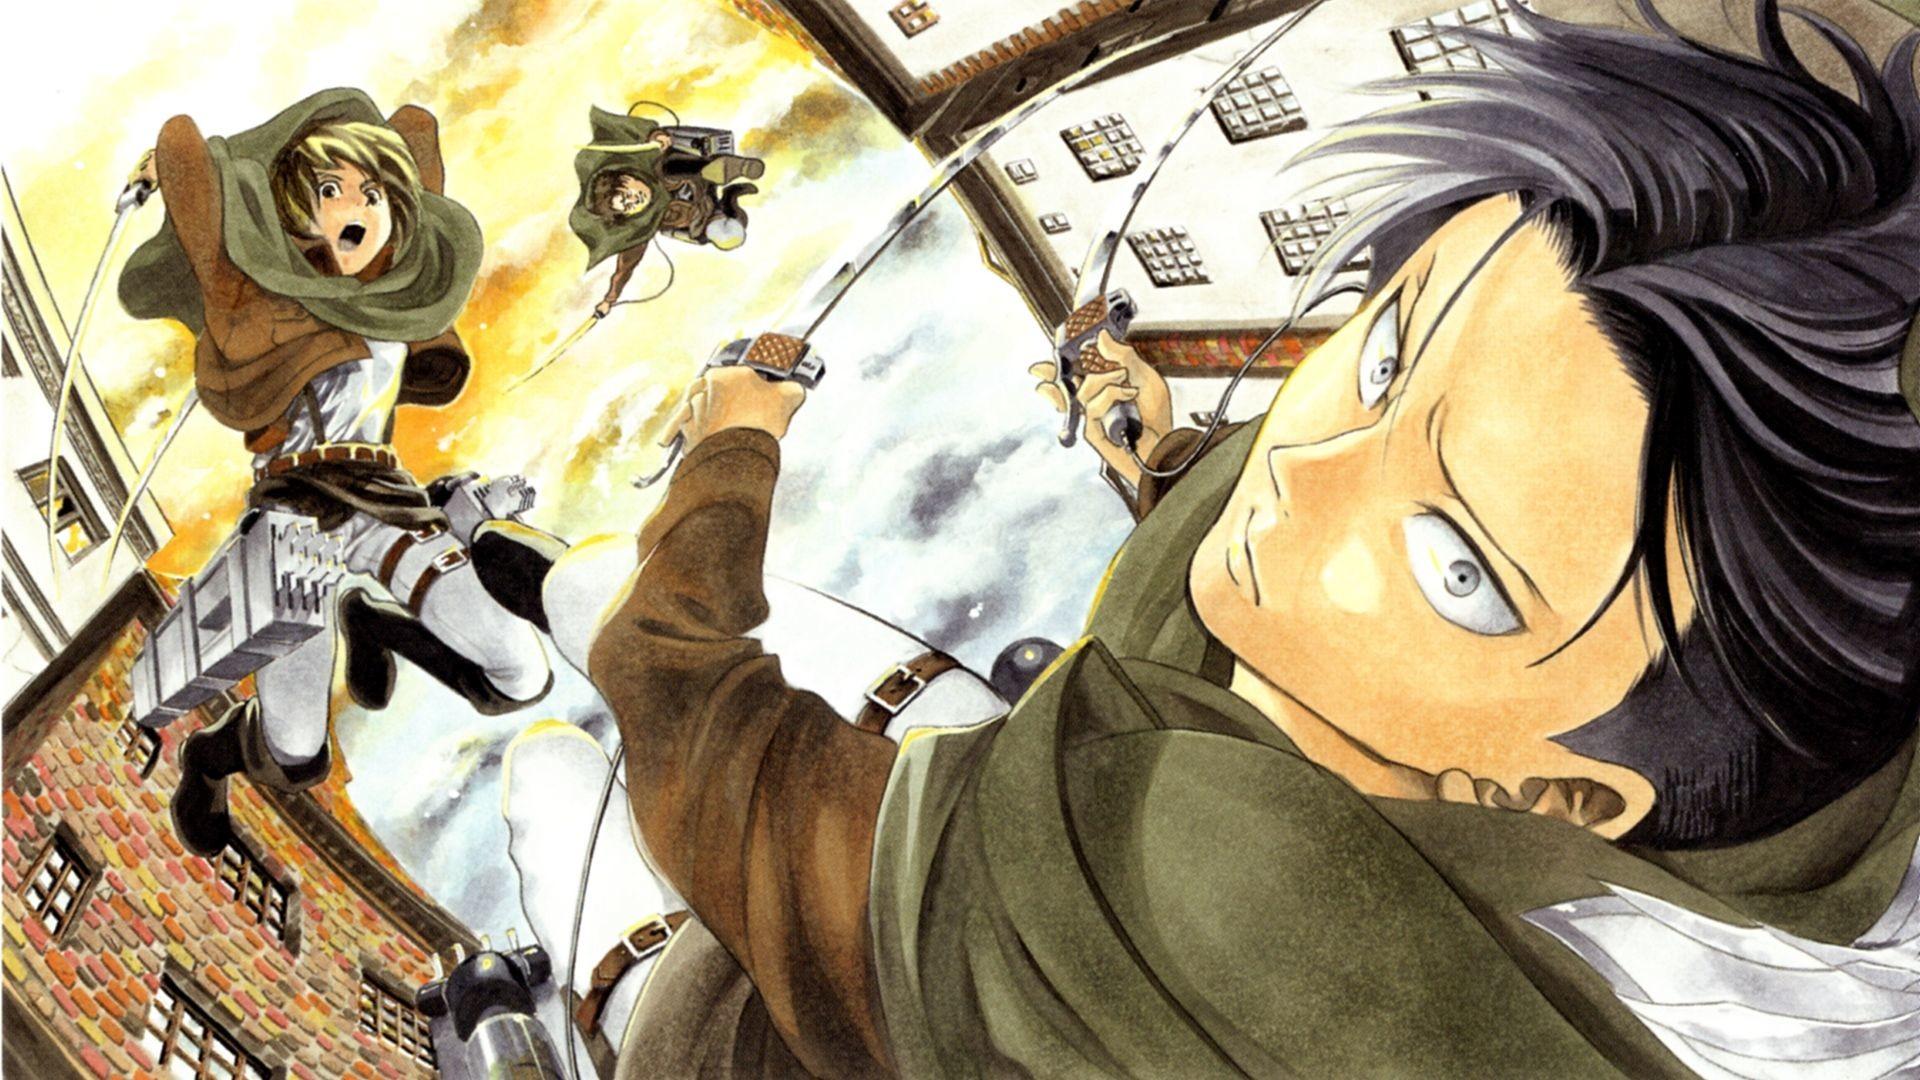 Levi attack on titan shingeki no kyojin anime hd wallpaper 1440×900 6g – Levi  Attack On